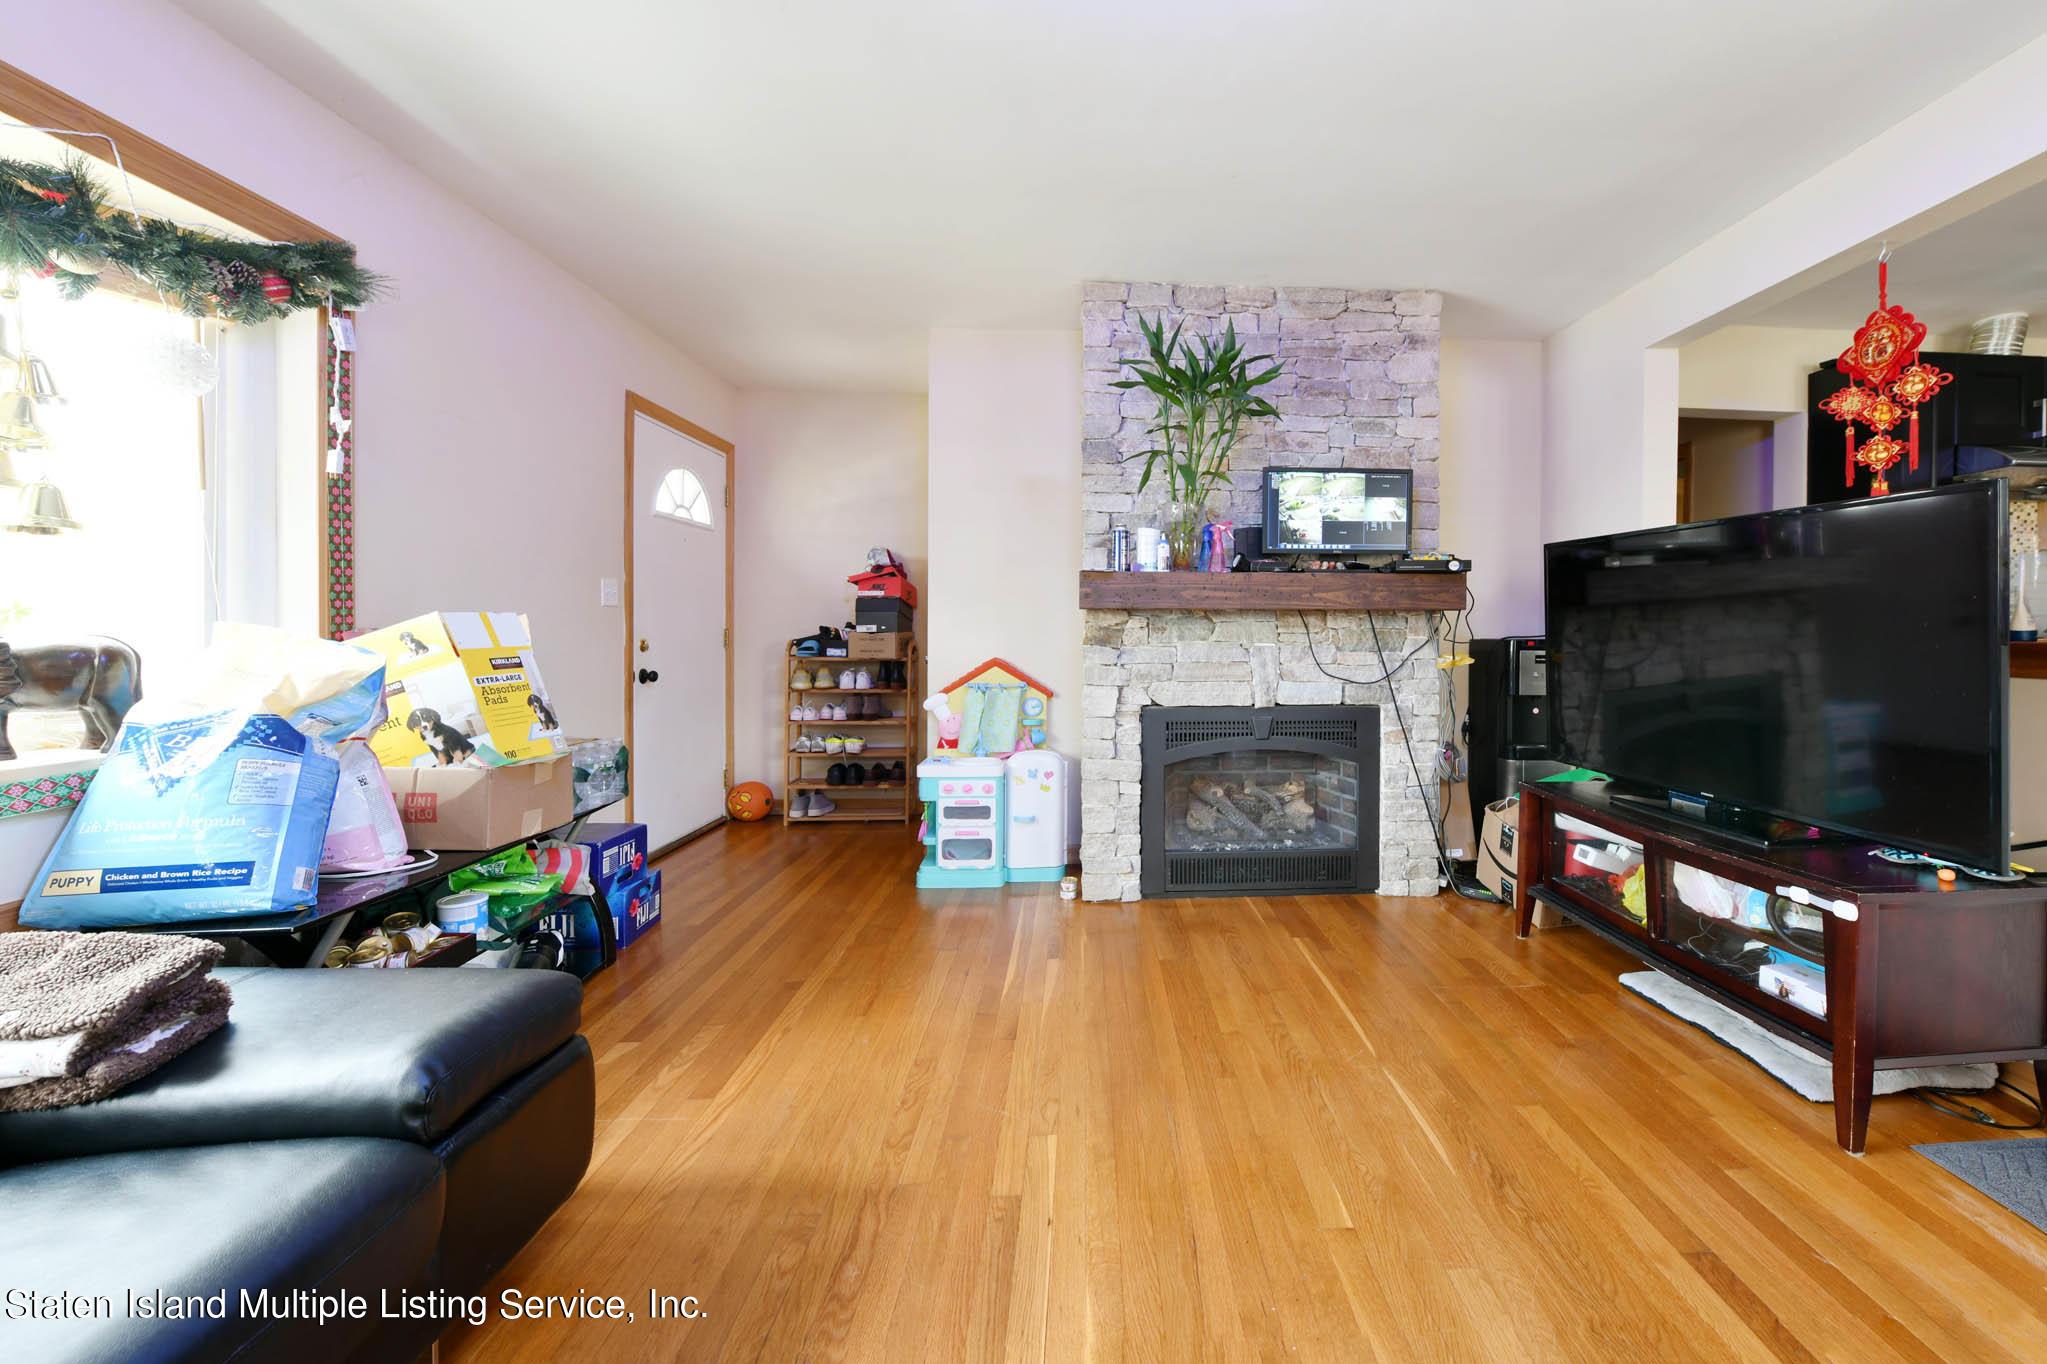 Single Family - Detached 110 Ravenhurst Avenue  Staten Island, NY 10310, MLS-1143189-3